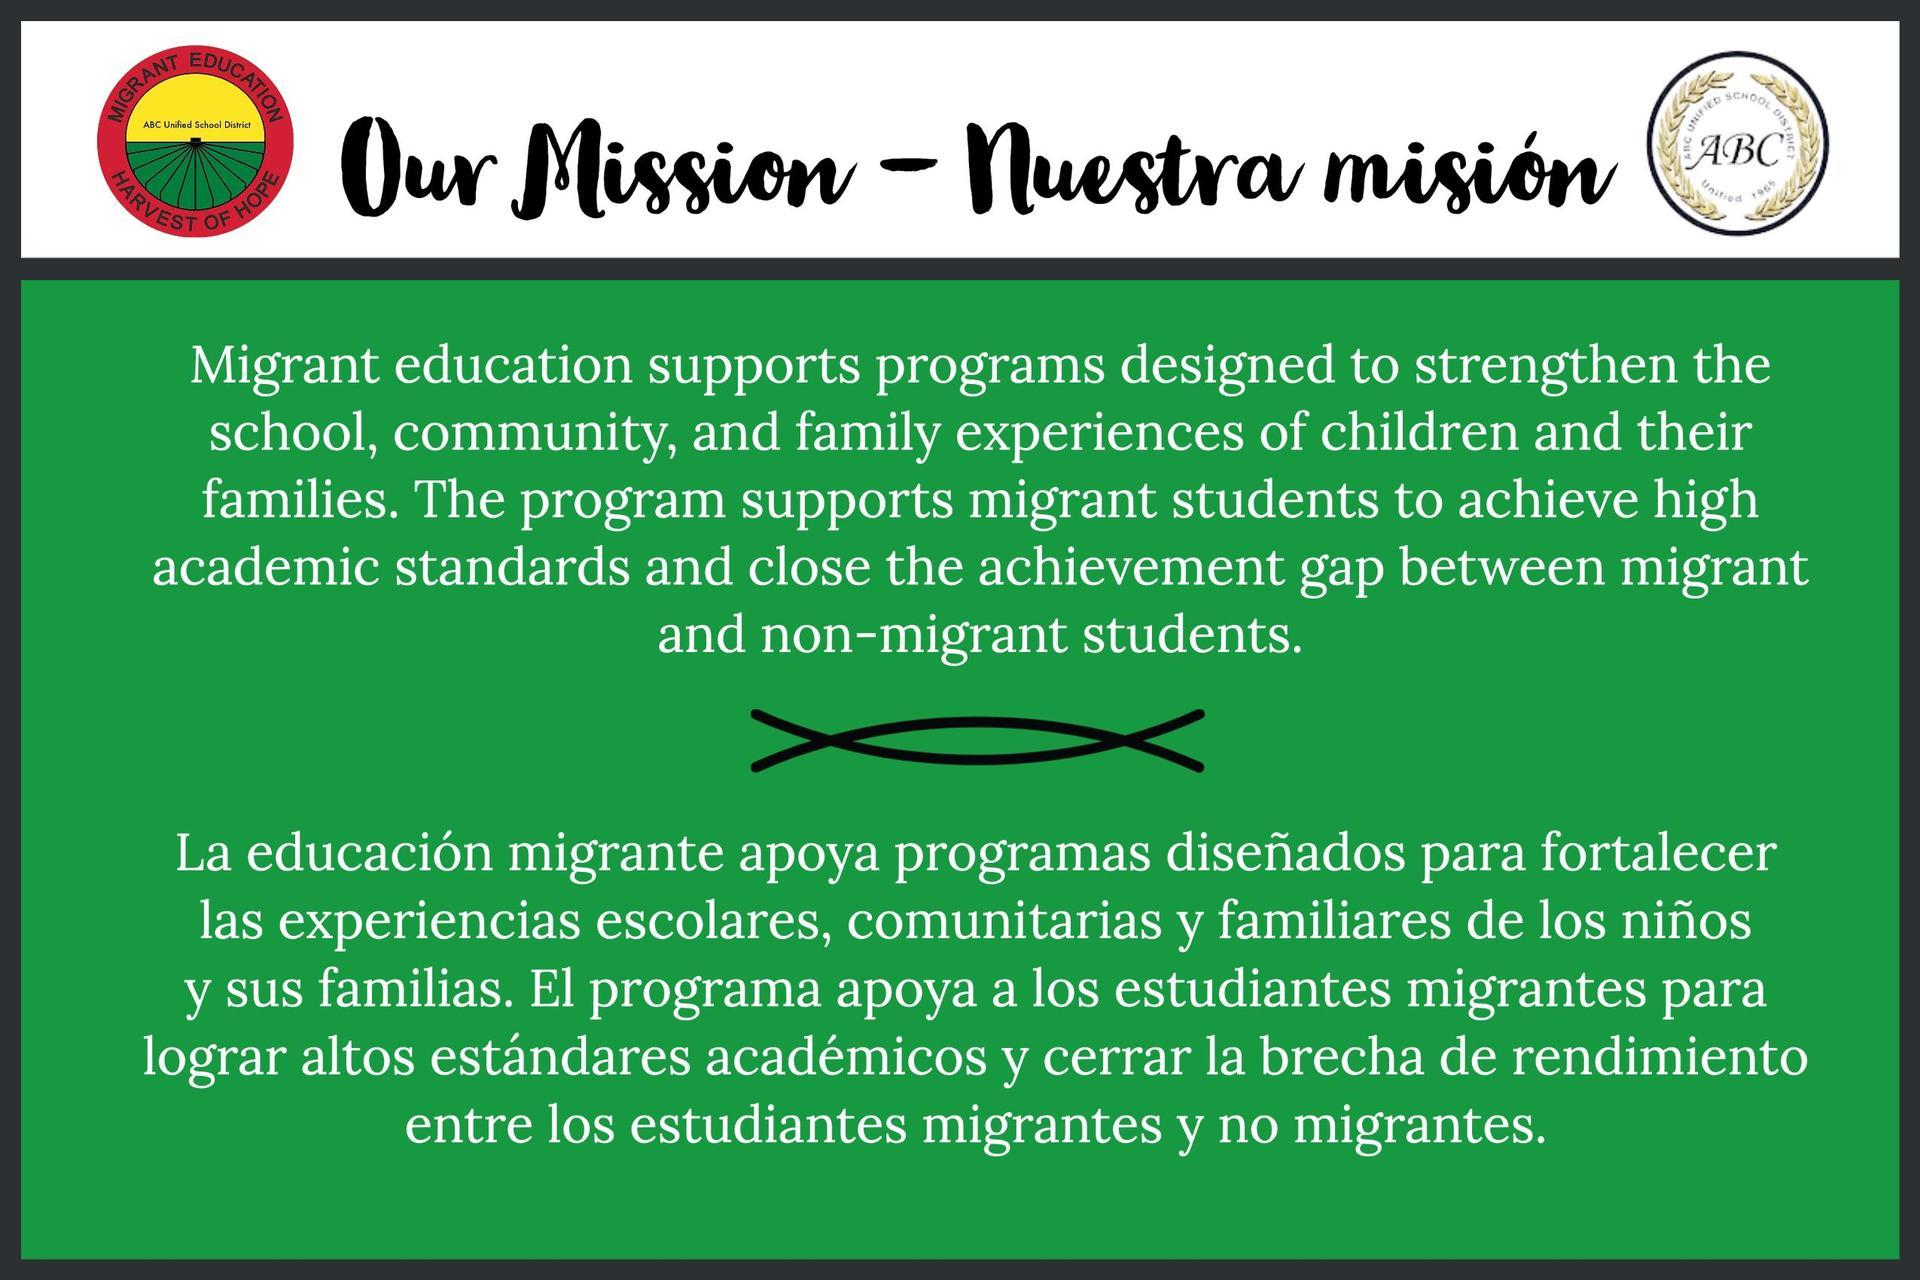 Migrant Education Program Mission